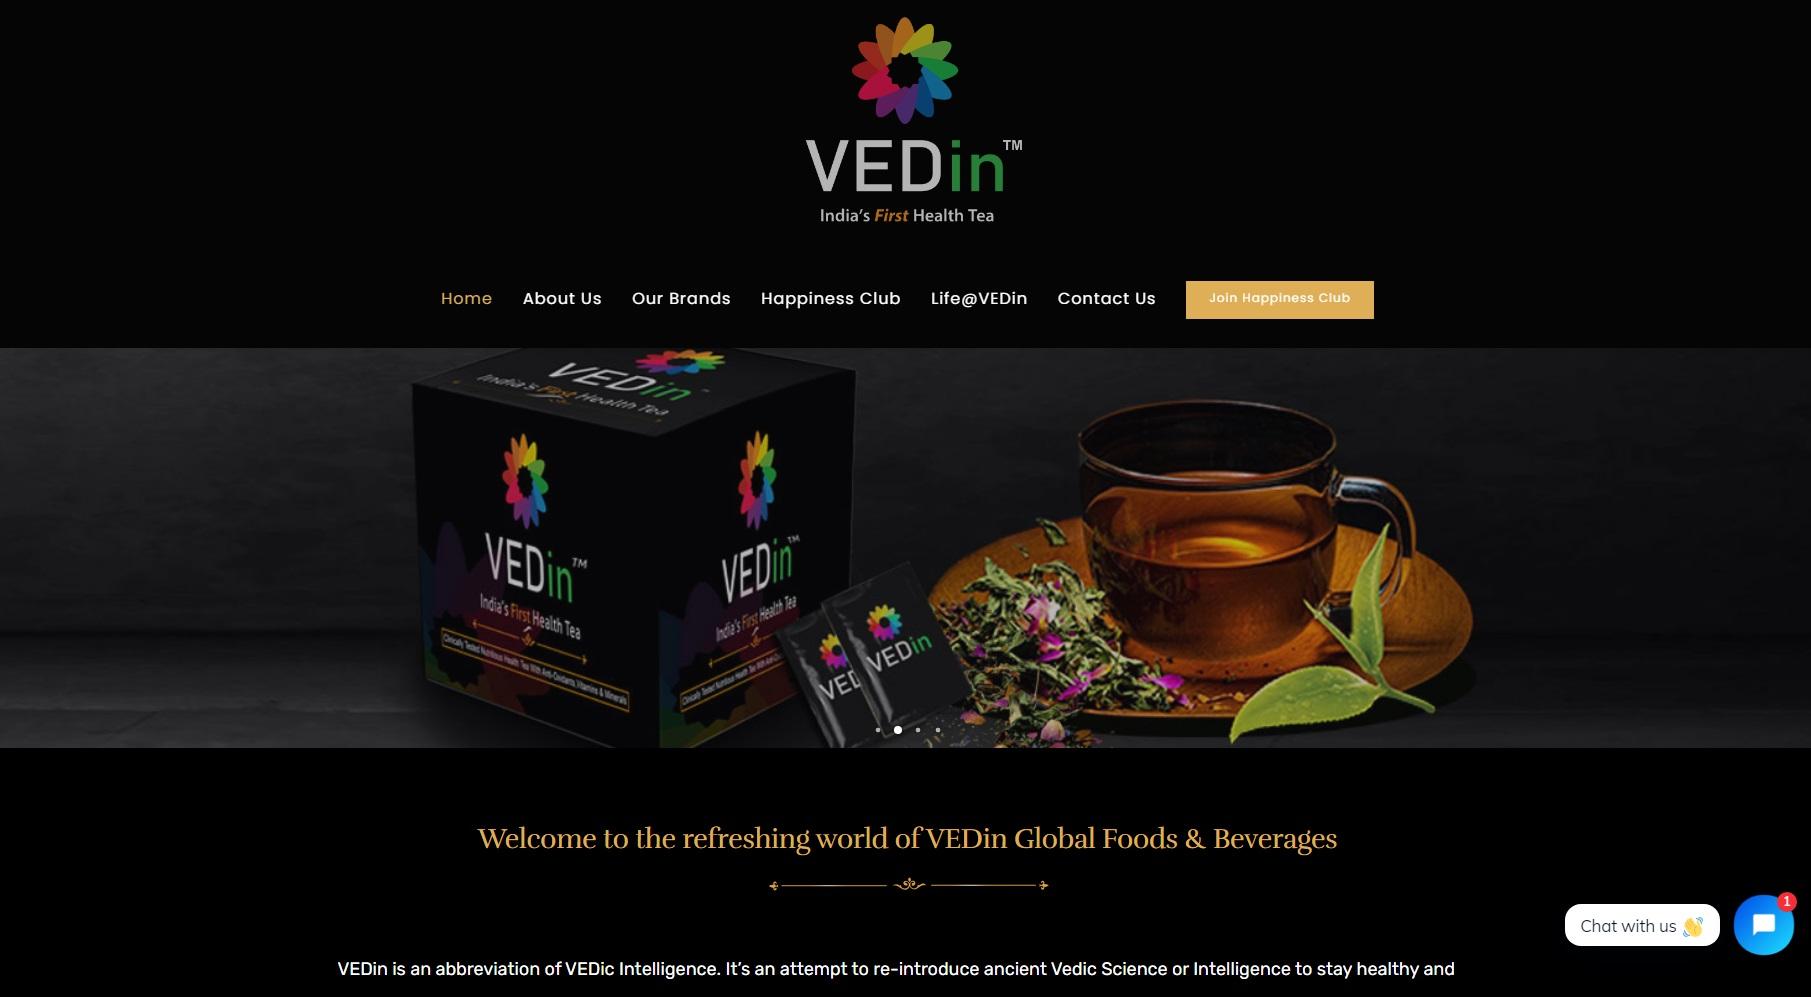 The VEDin Black Tea - Starland IT Solution